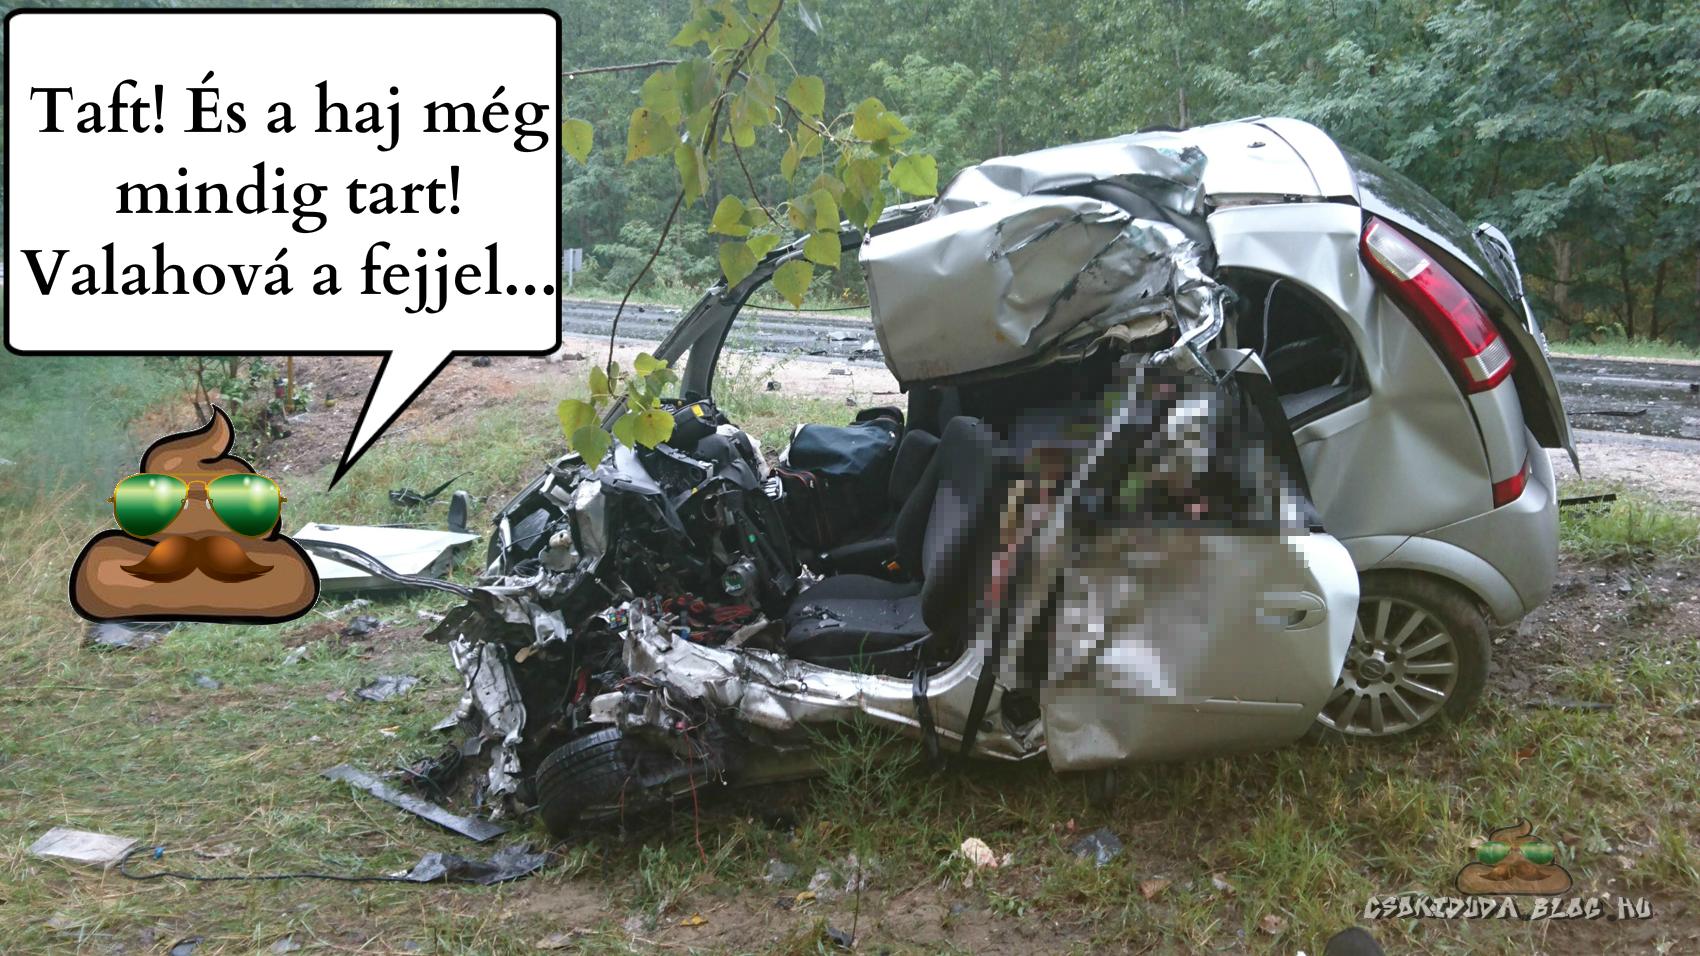 kocsi_taft_a_haj_meg_mindig_tart.jpg